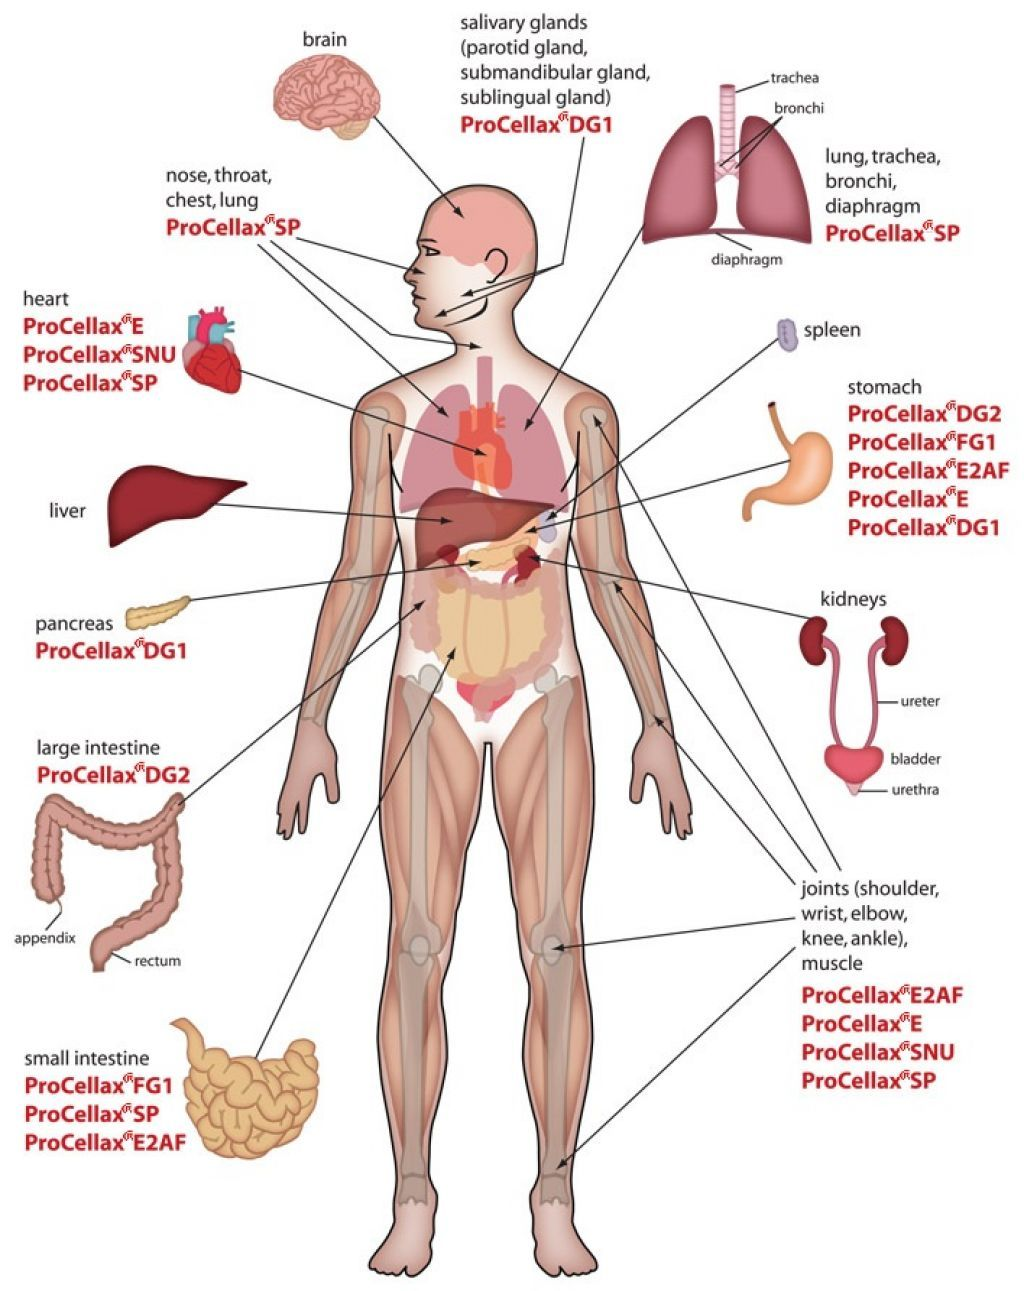 human body anatomy internal organs diagram [ 1024 x 1291 Pixel ]